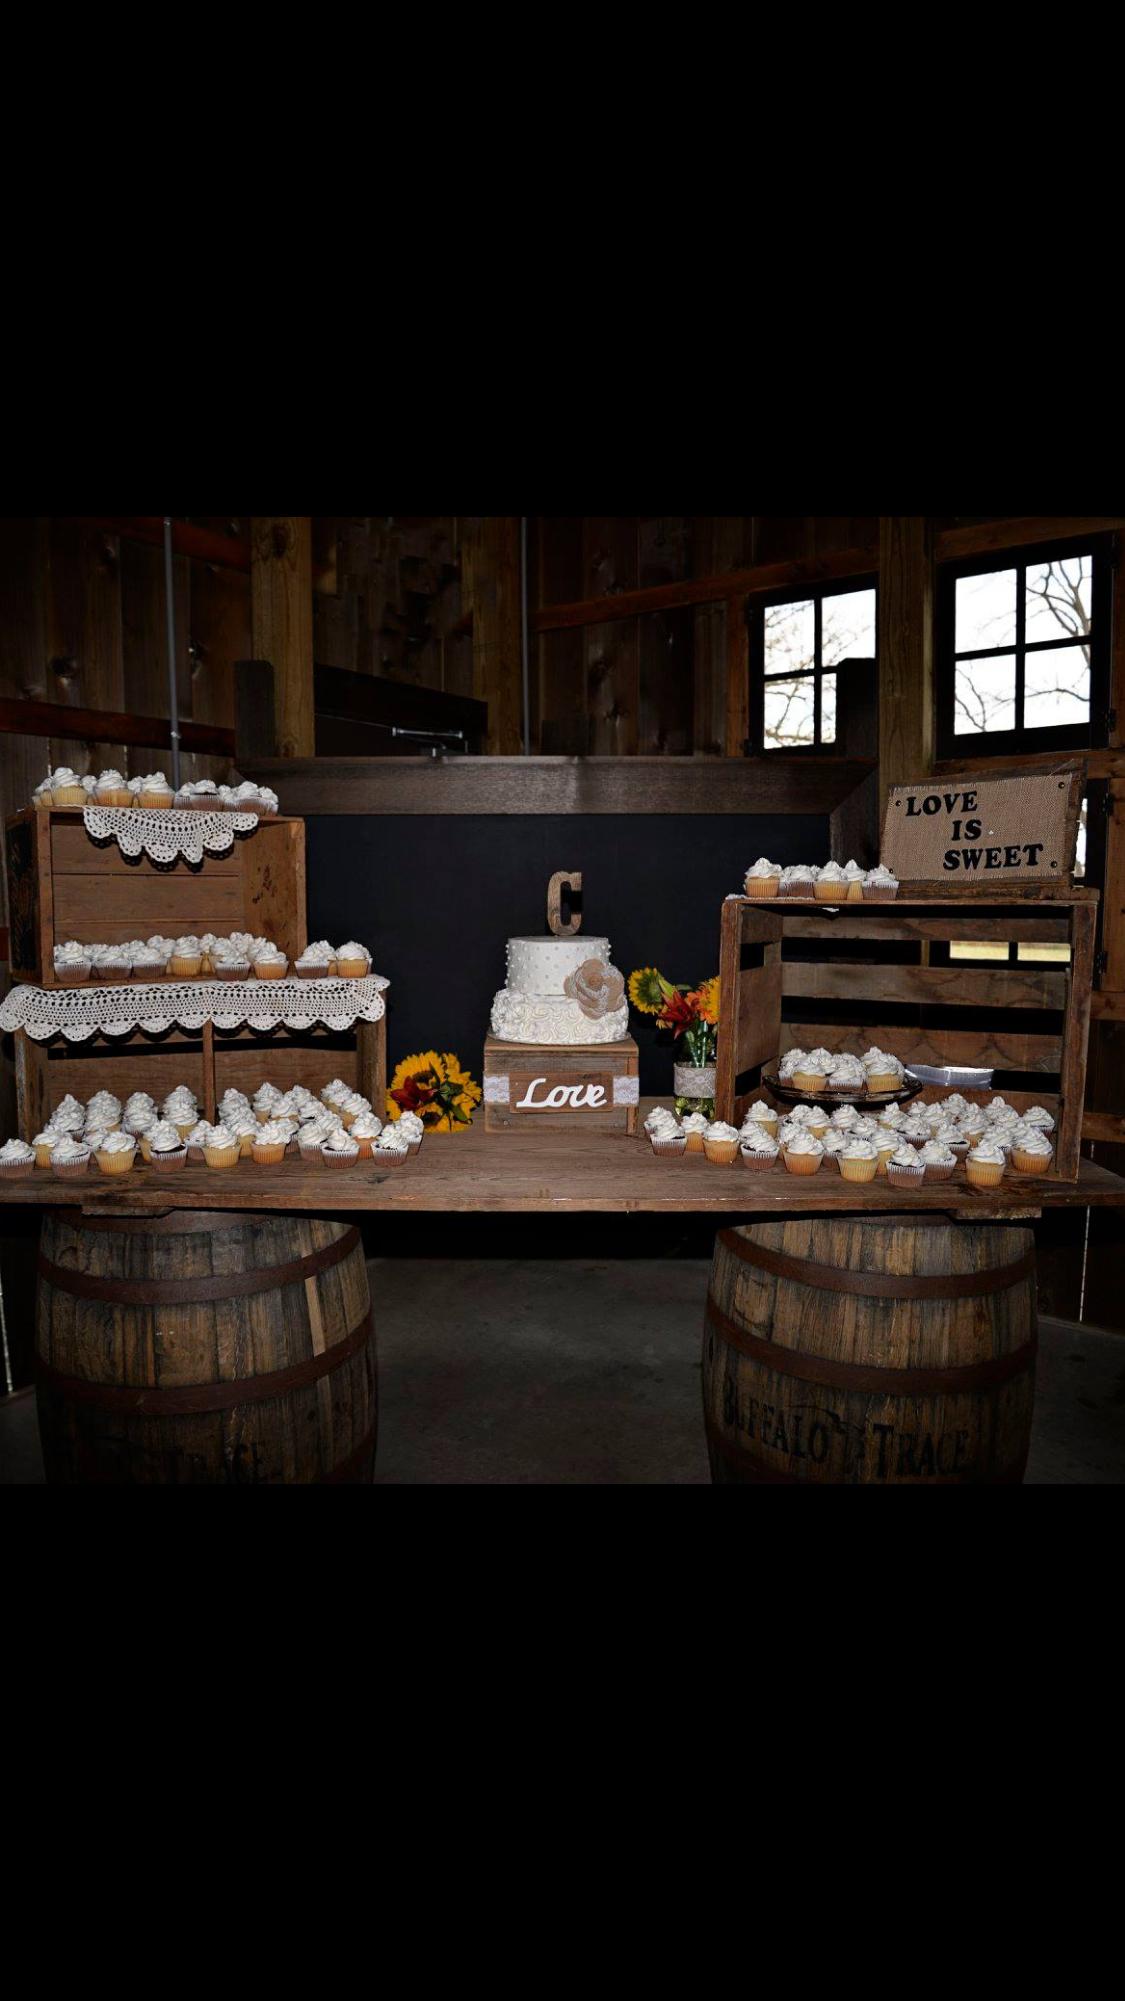 Country Rustic Wedding Cake Display Crates And Barn Wood Door